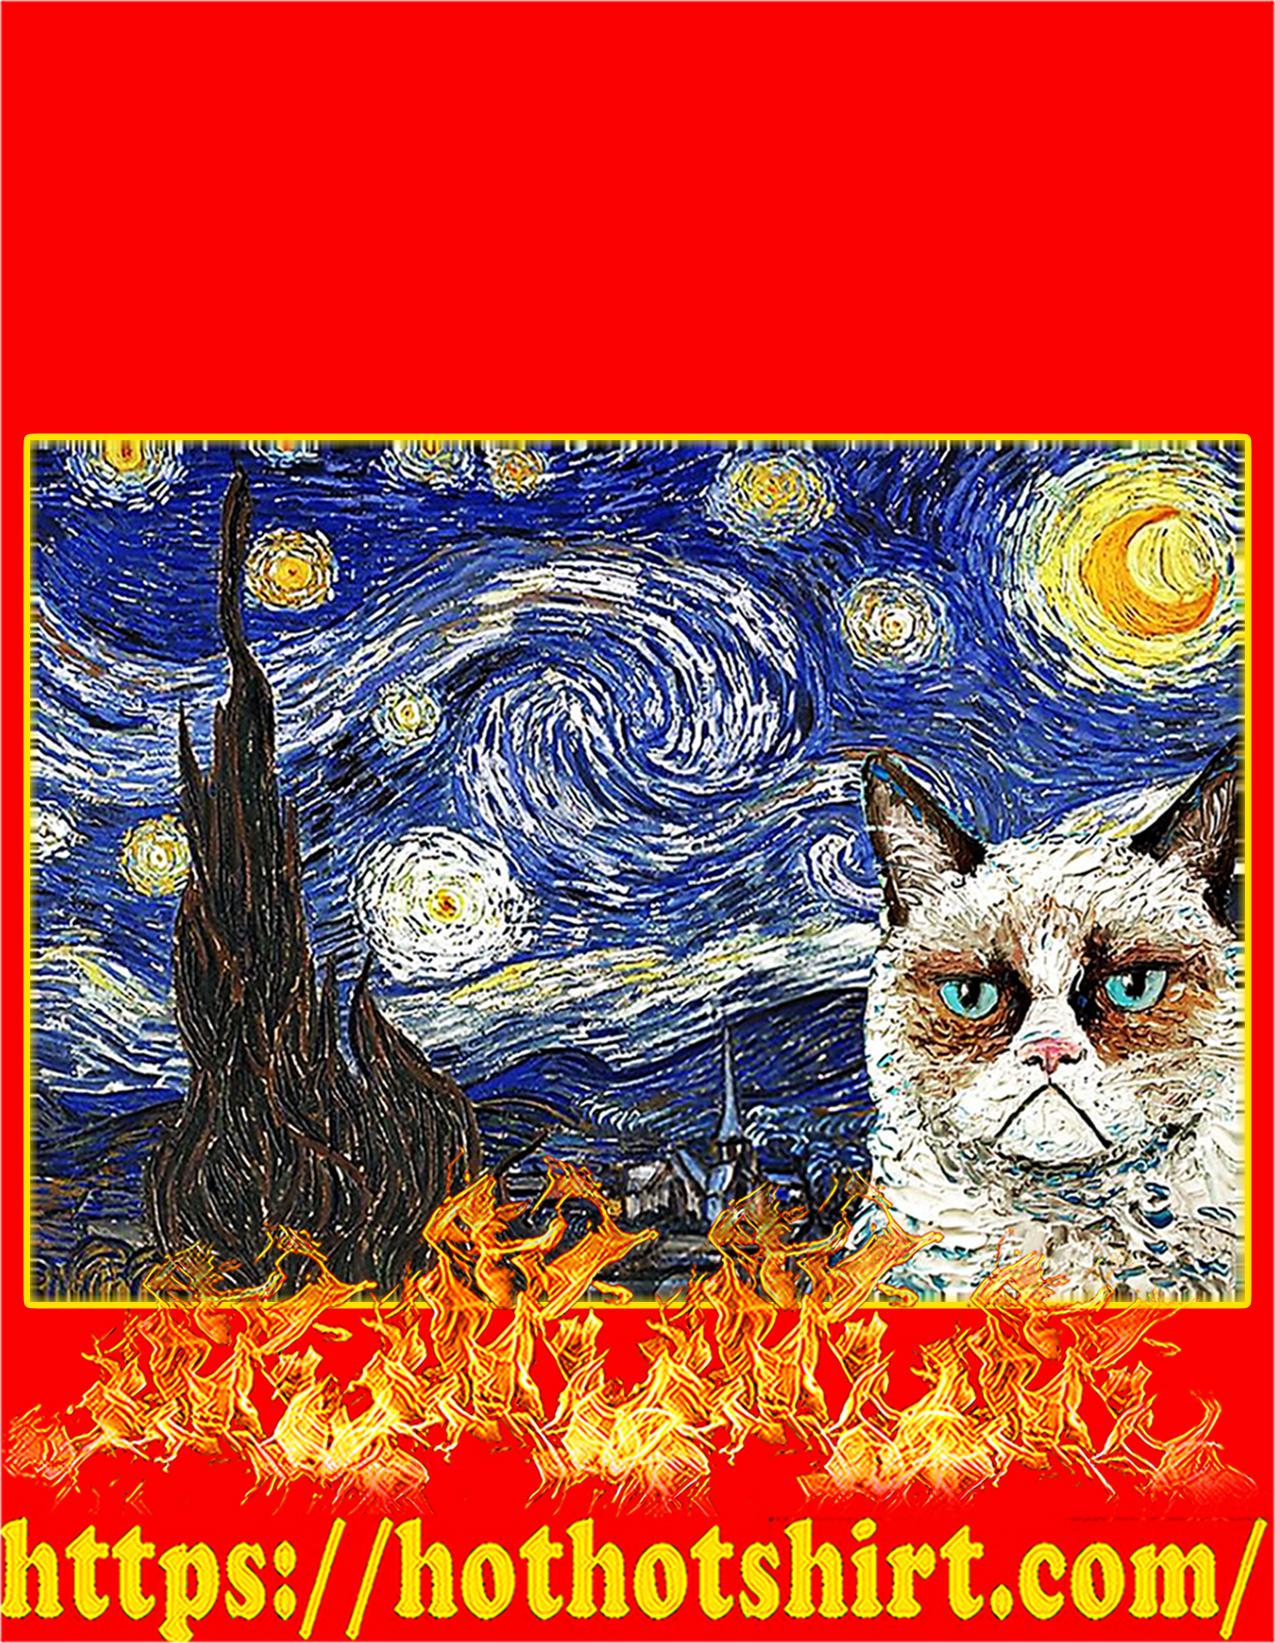 Grumpy cat starry night poster - A2